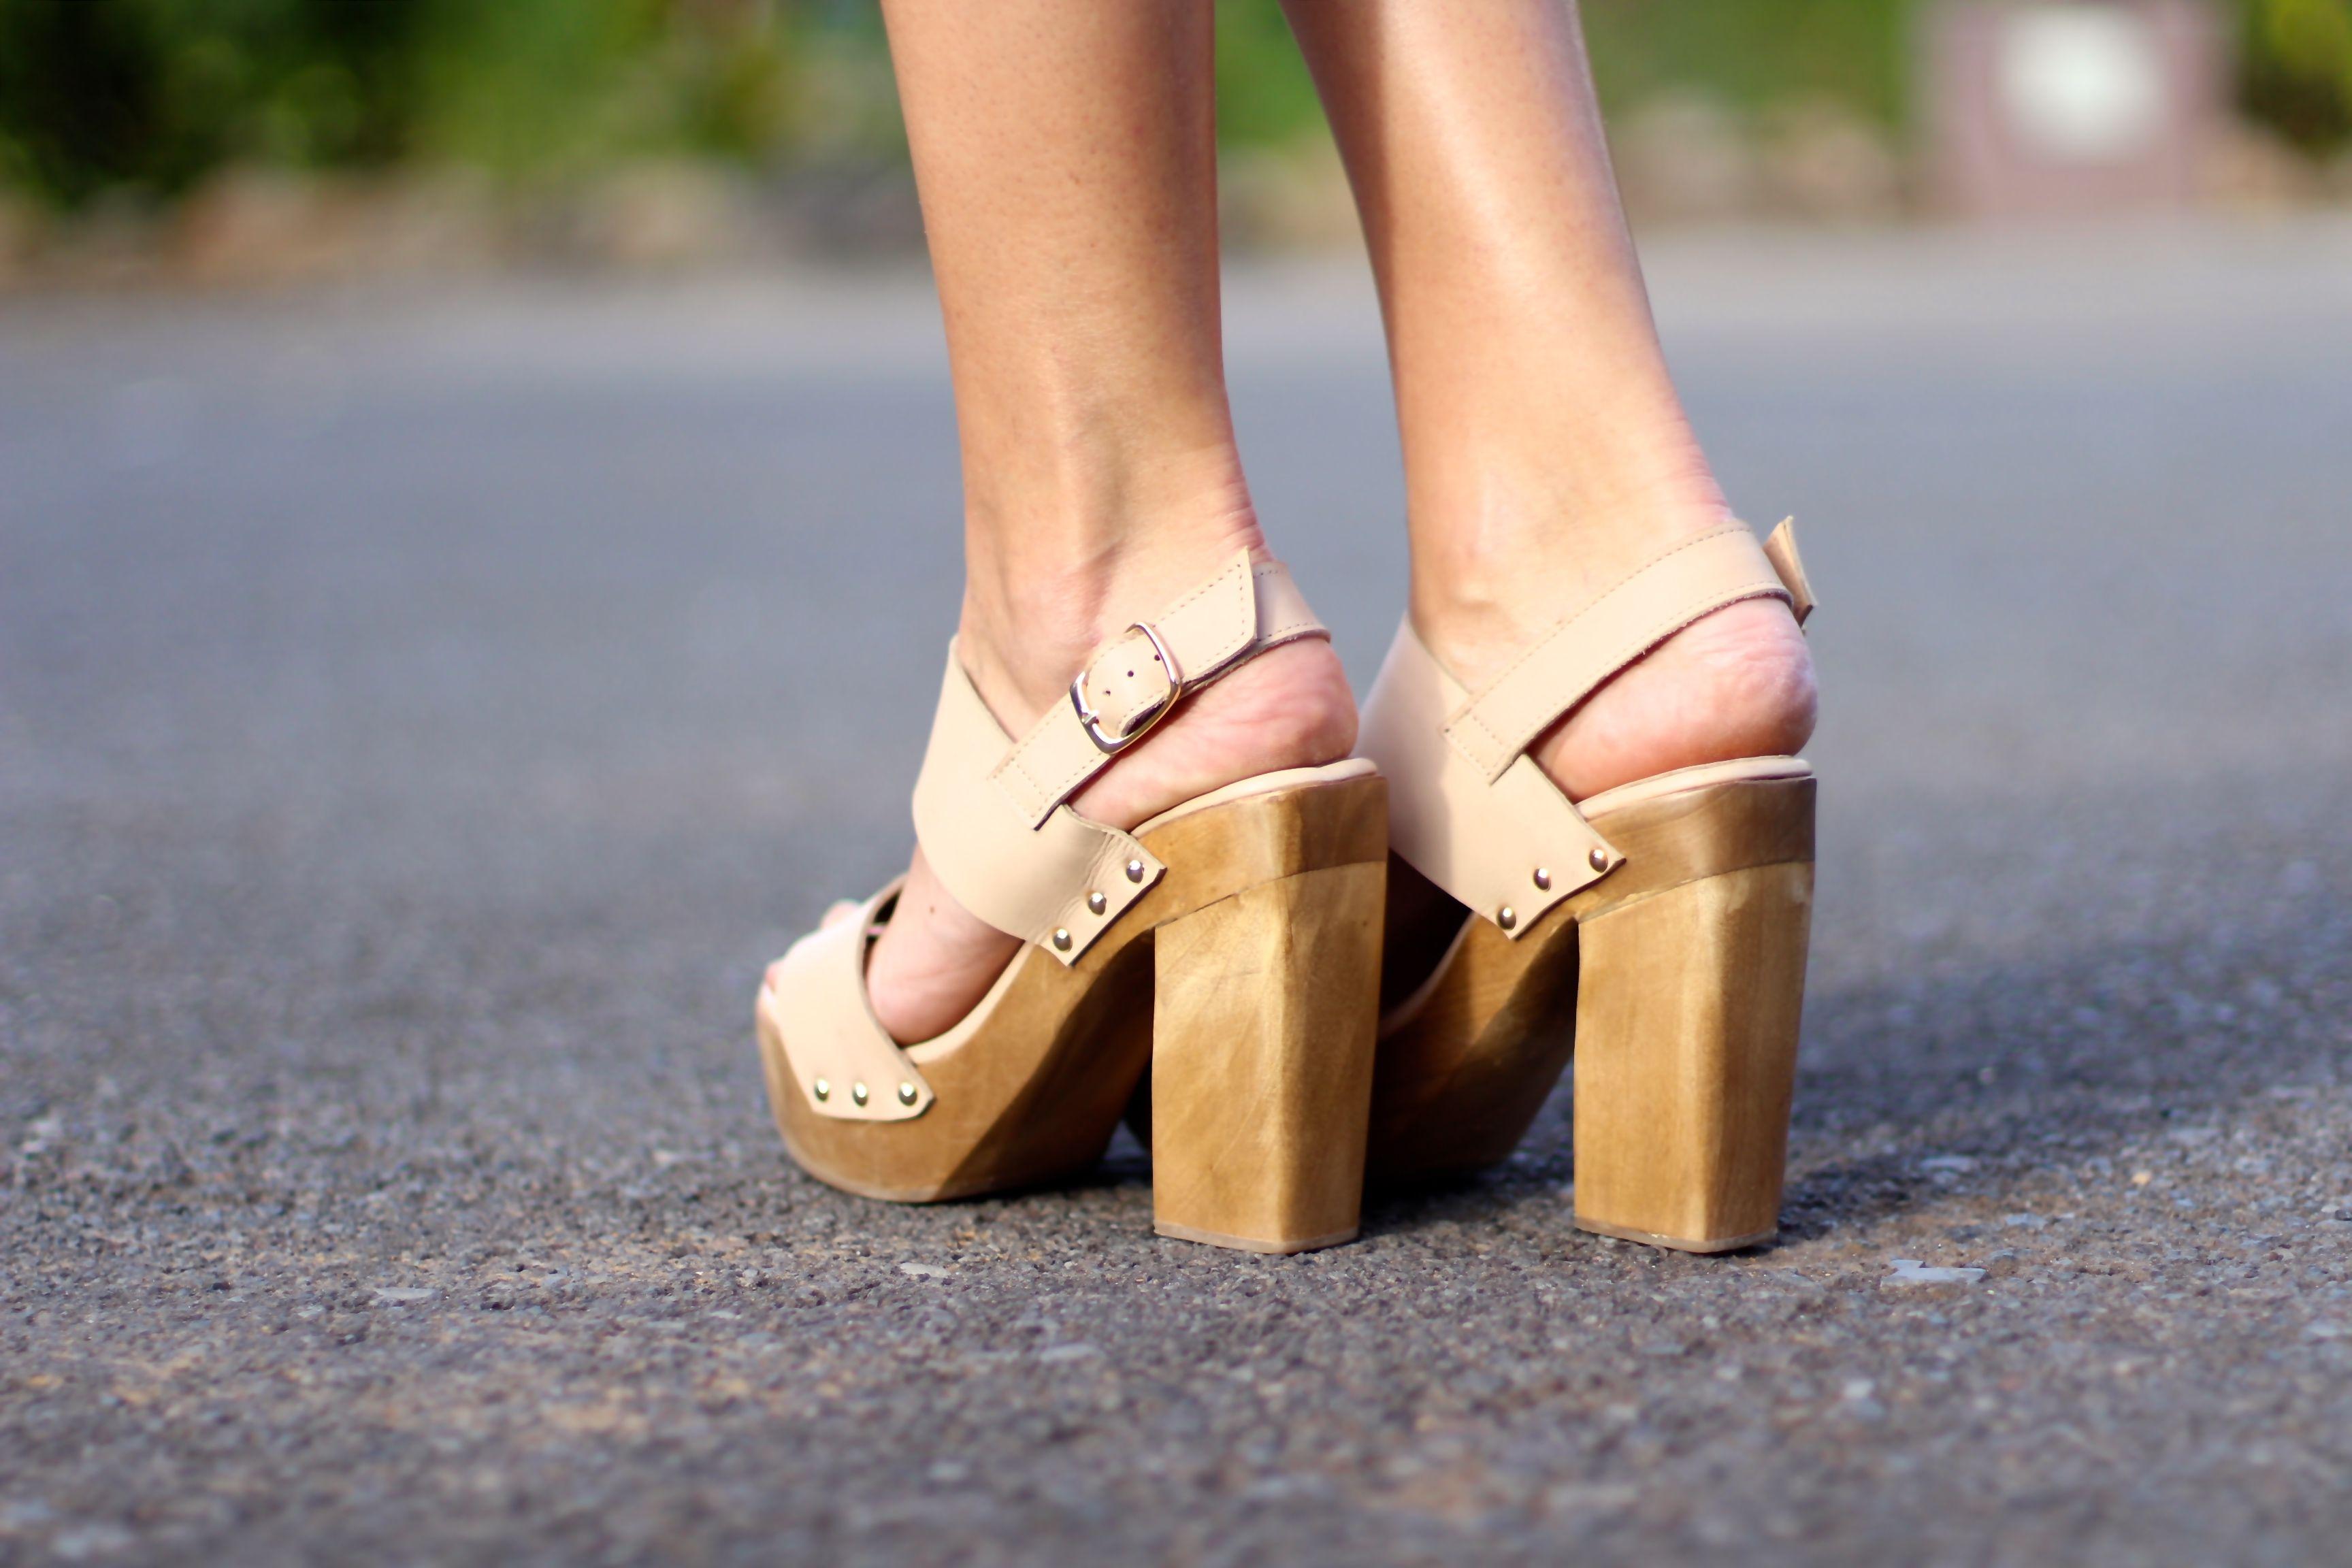 IT Jane sandals from IT Shoes #itshoes #justforitgirls #highheels #sandals #suedesandals #shoes #platforms #woodplatforms #shoppingonline #fashionblogger